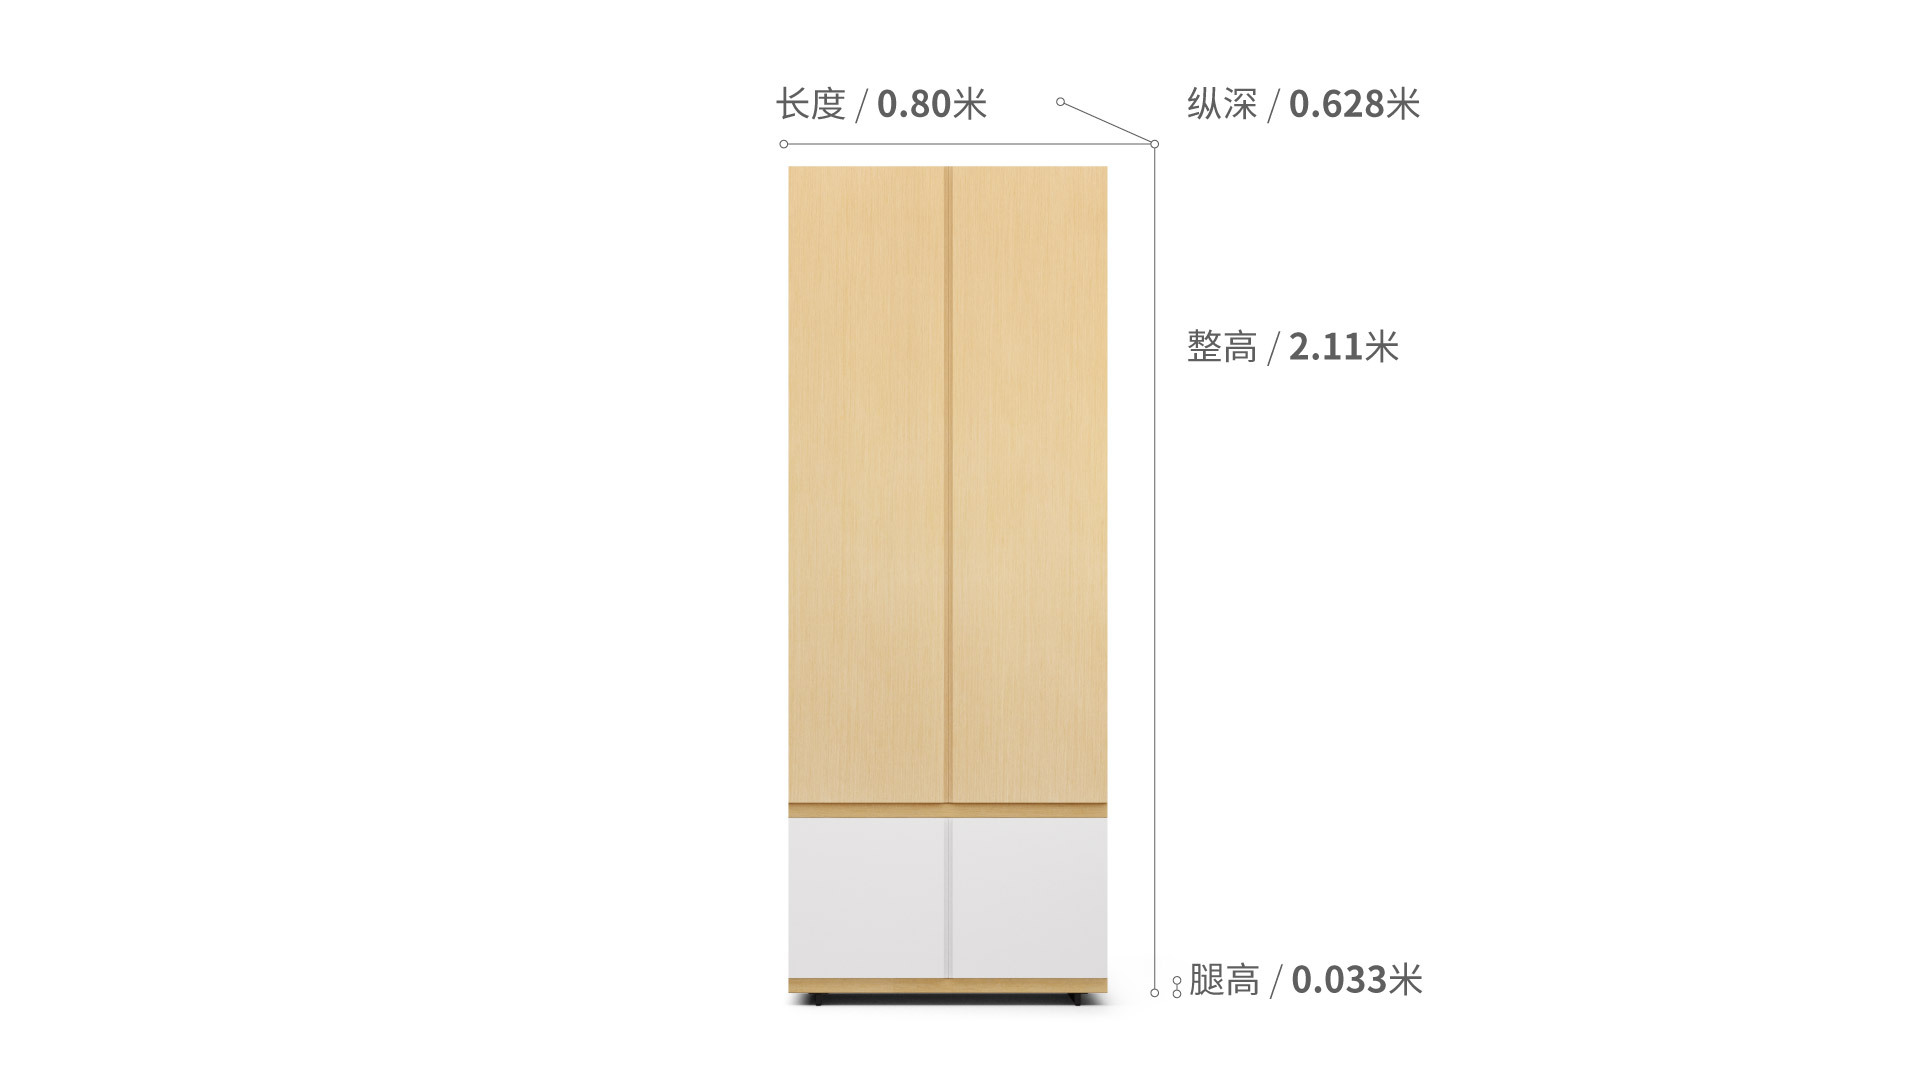 COSMO星格?衣柜·斗柜2.1米高2門衣柜D柜架效果圖